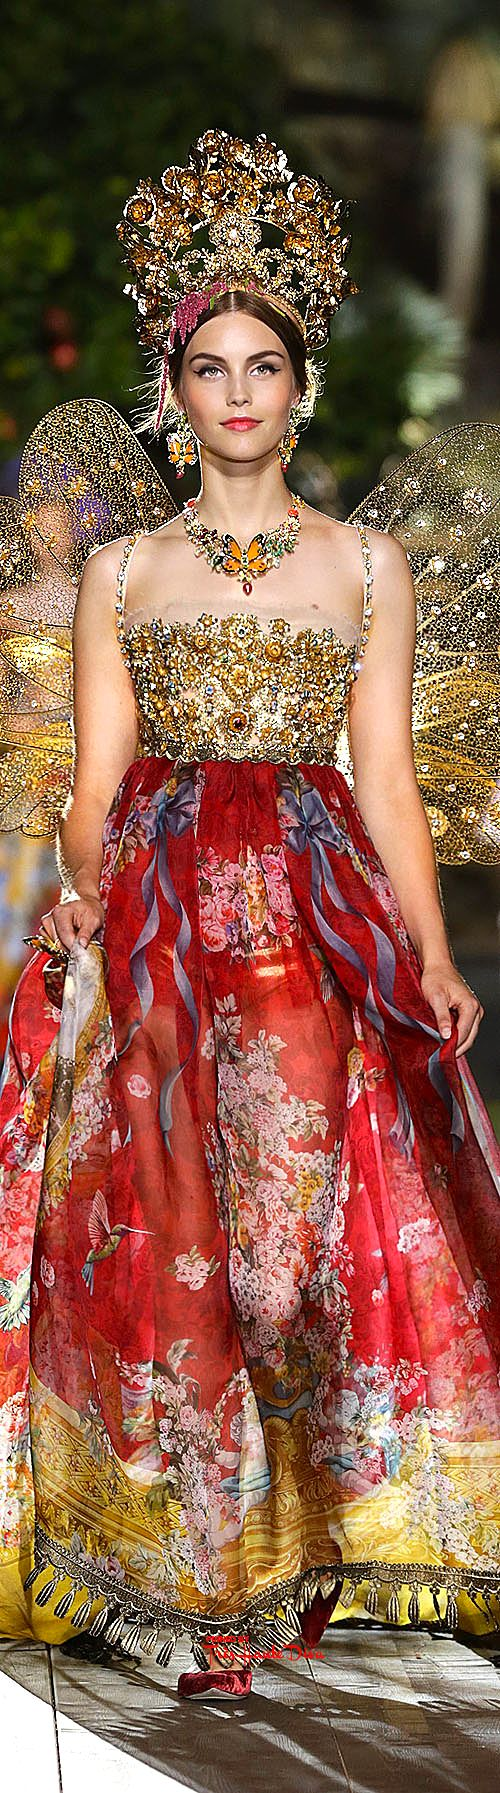 best ಌ my style ಌ images on pinterest feminine fashion